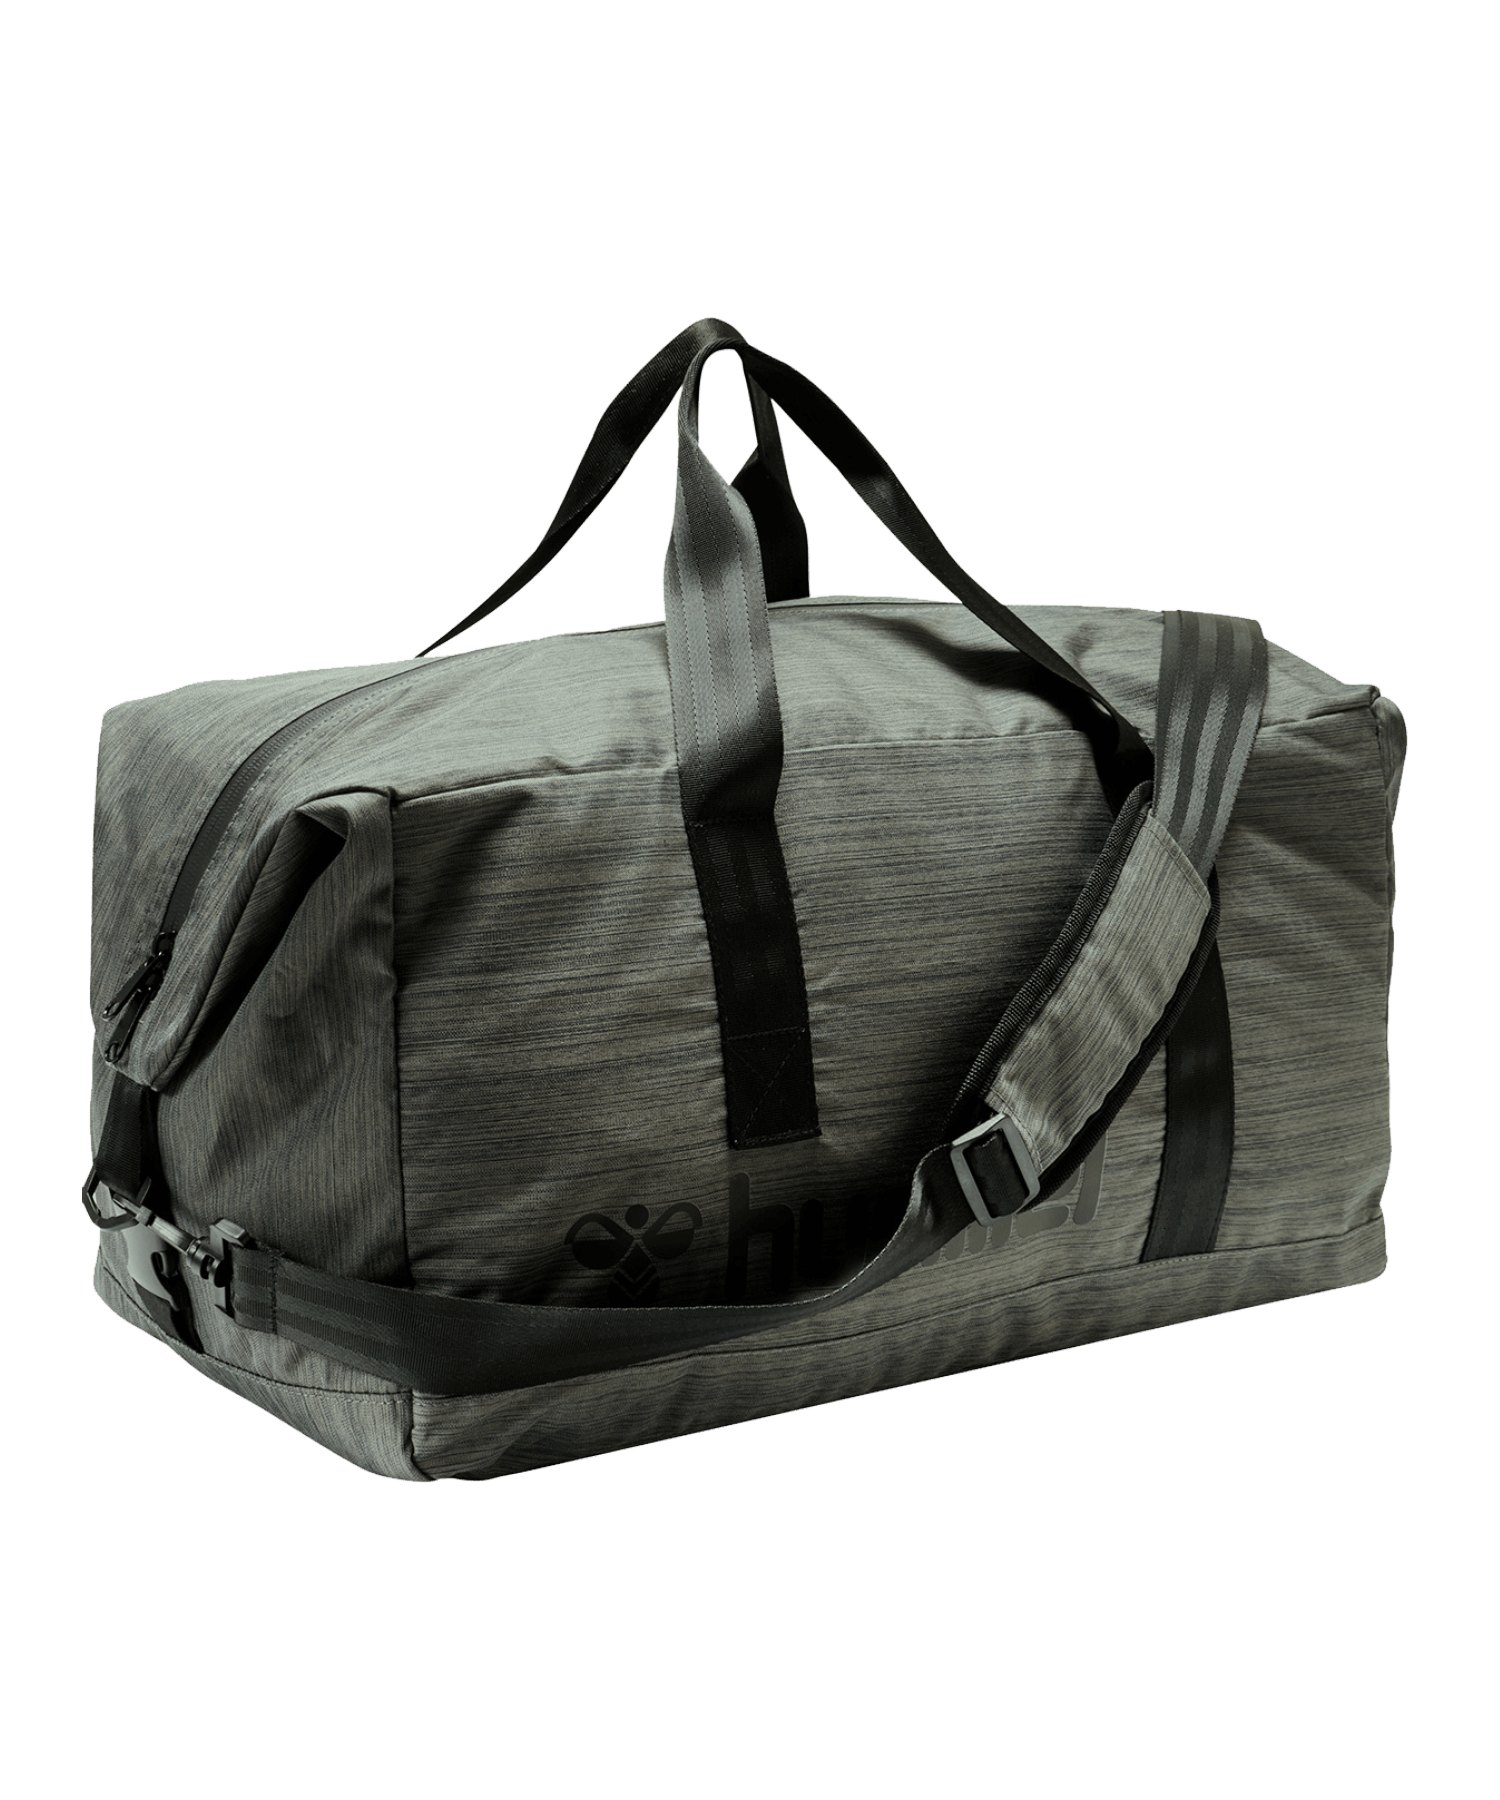 Hummel Urban Duffel Bag Large Grau F1502 - grau